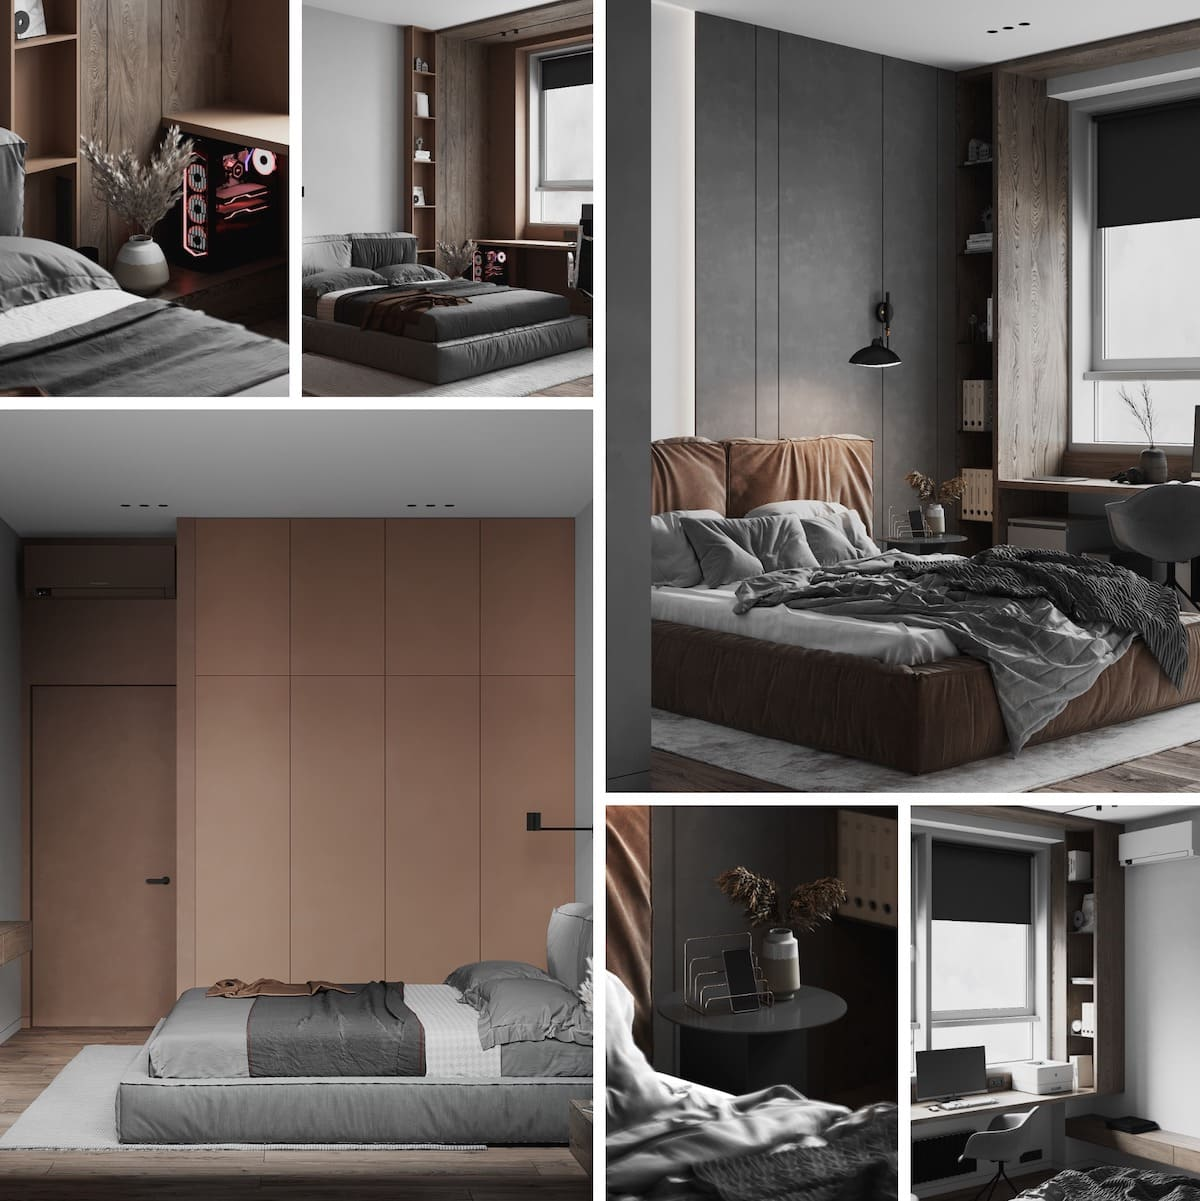 модный дизайн интерьера квартиры фото 10